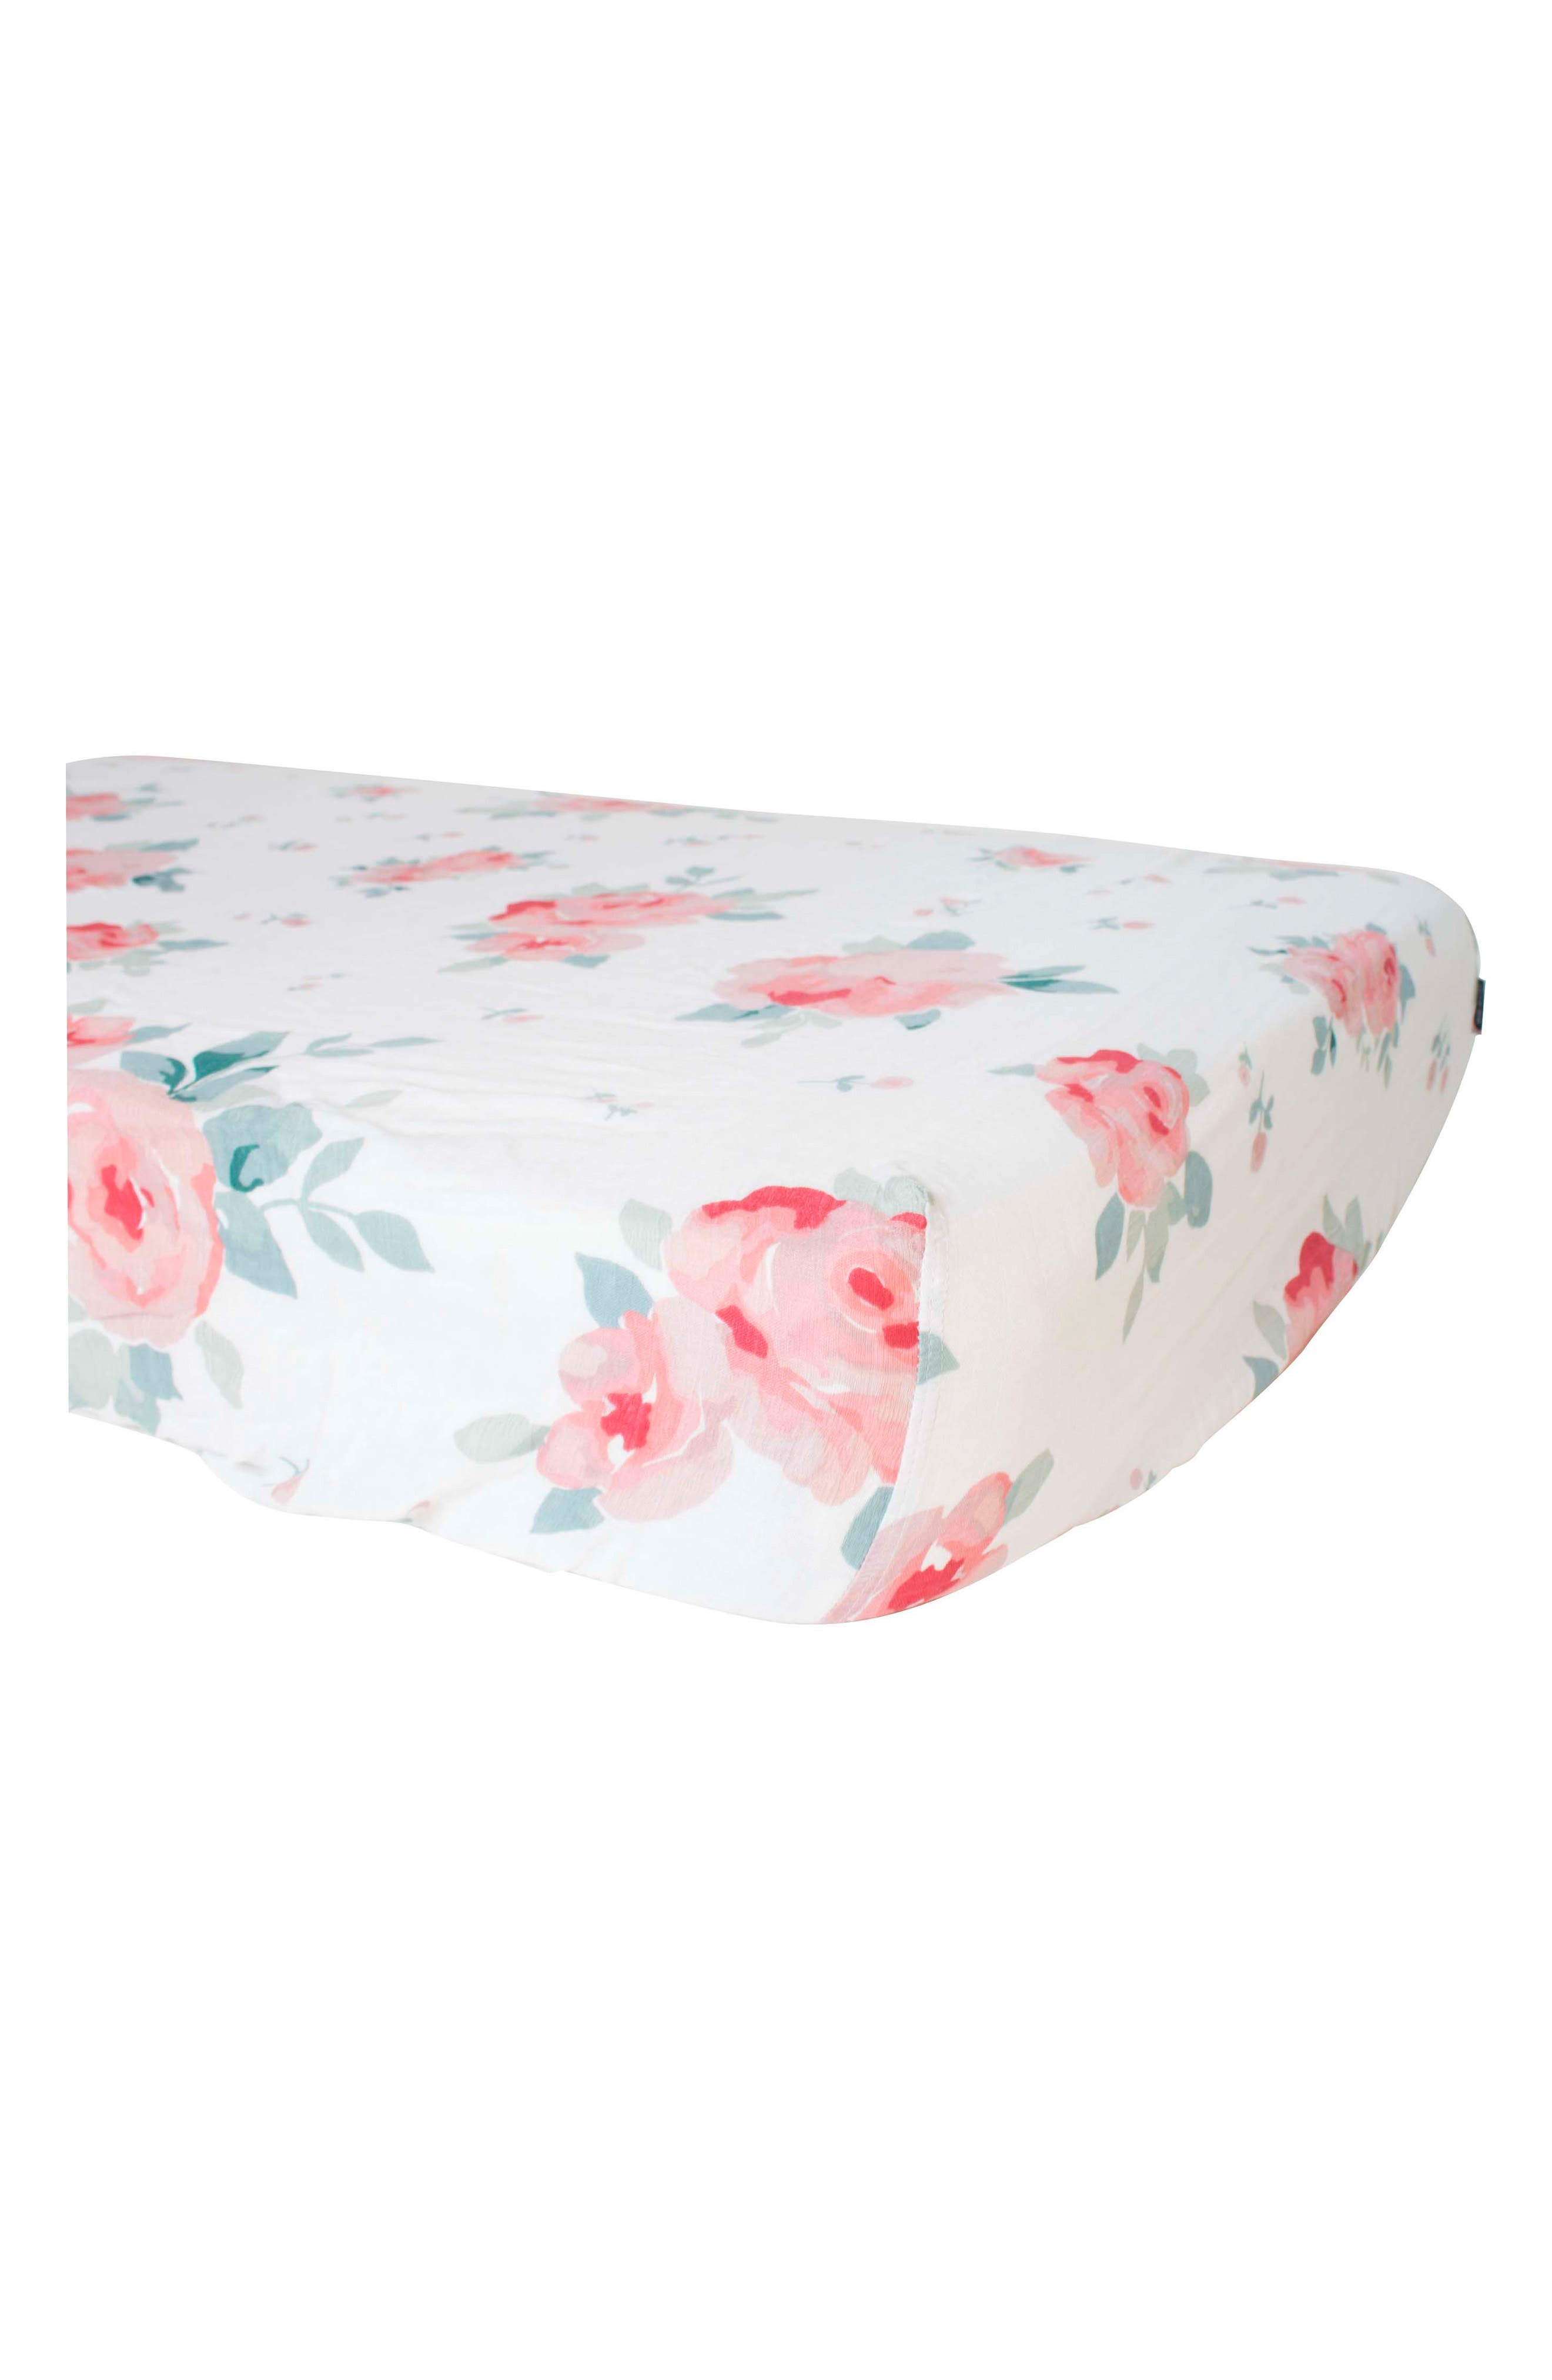 Oh So Soft Muslin Crib Sheet,                         Main,                         color, ROSY